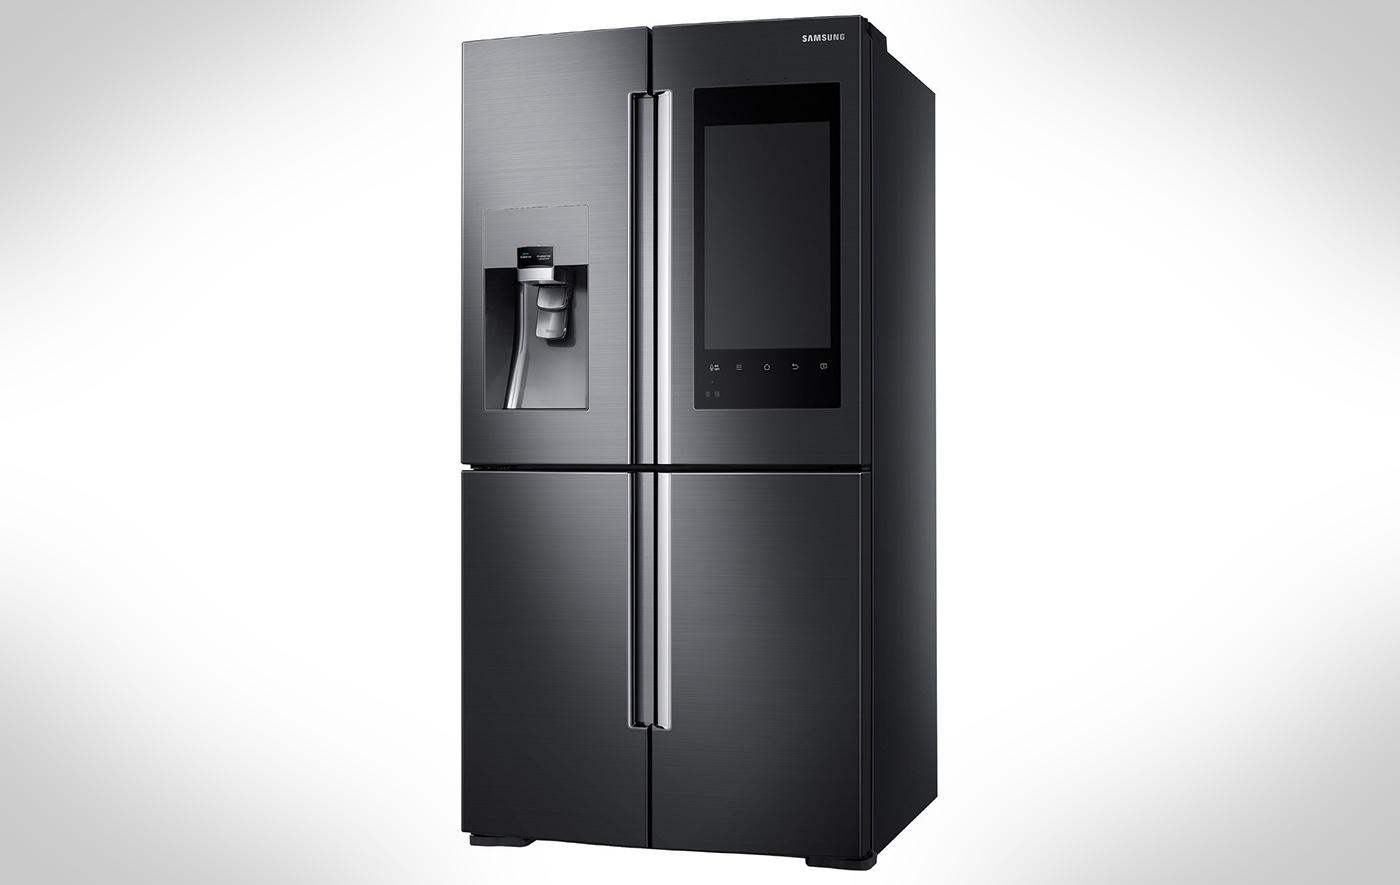 Samsung's latest smart fridge